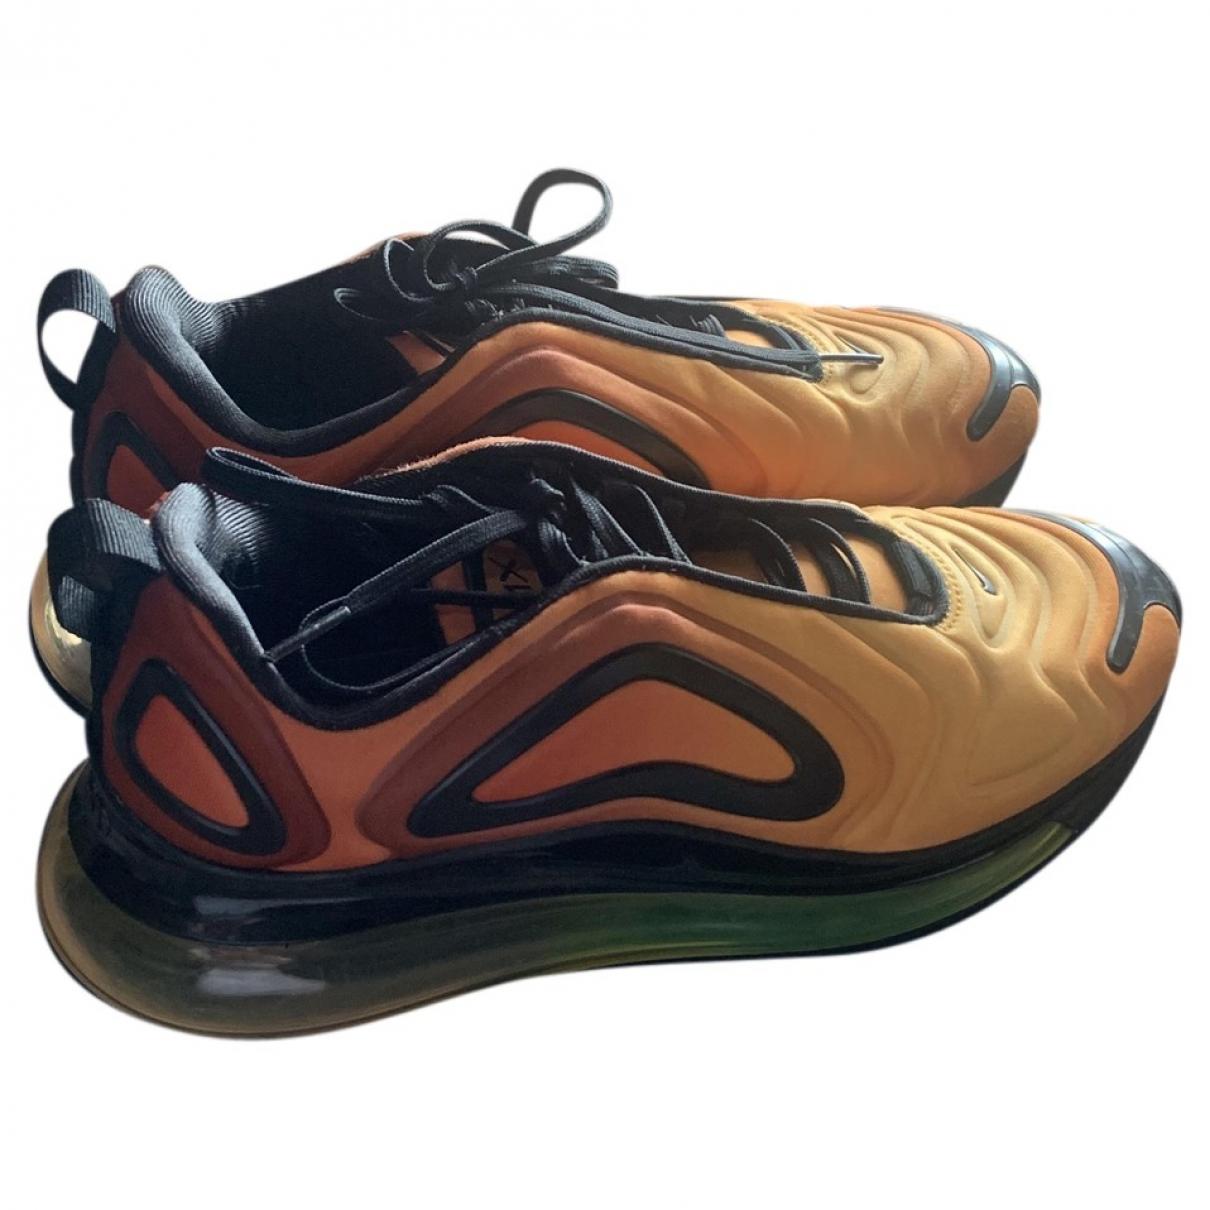 Nike Air Max 720 Sneakers in  Orange Kautschuk